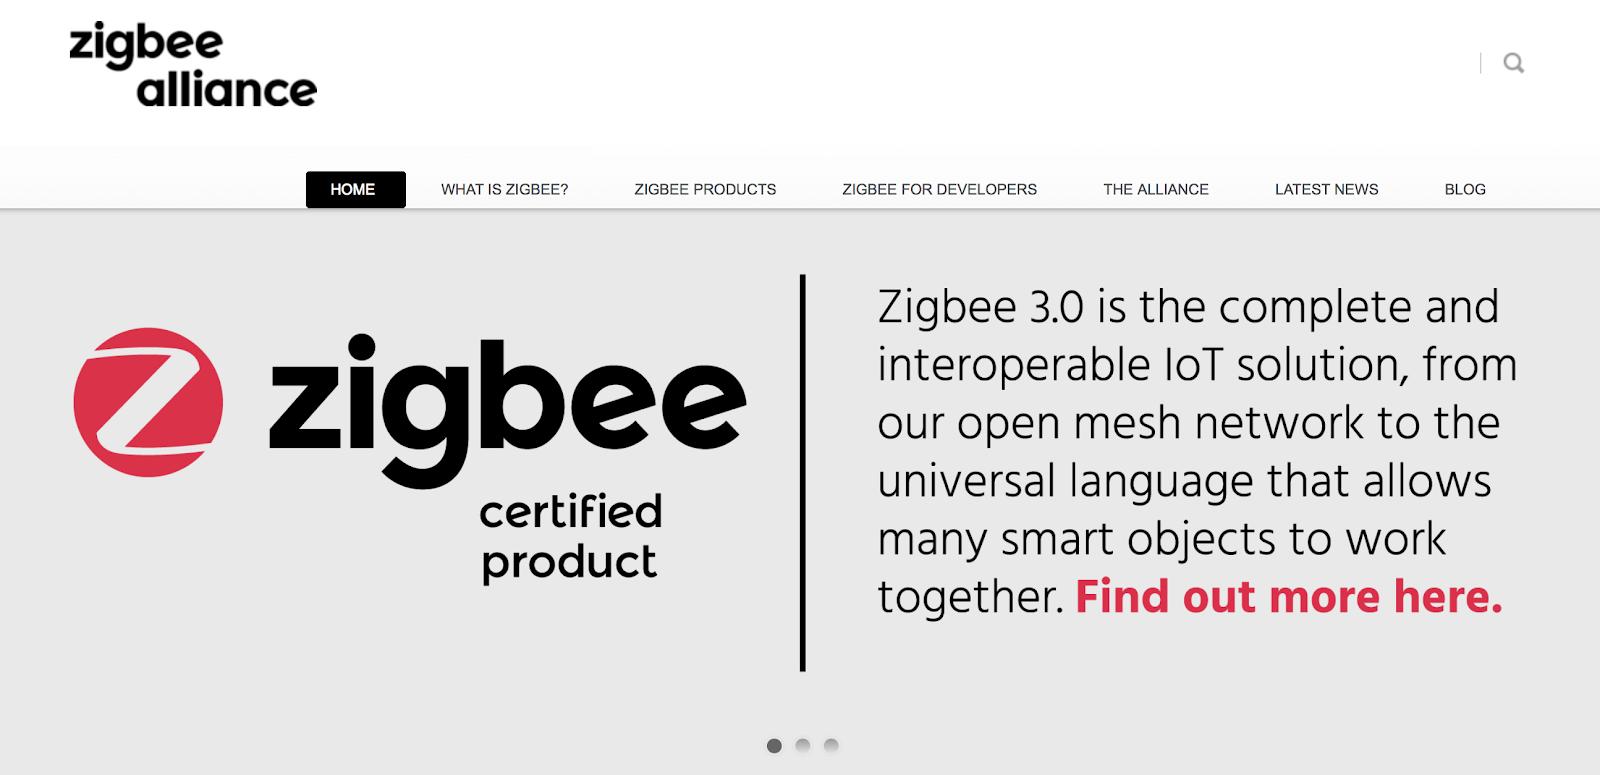 Cos'è la tecnologia Zigbee